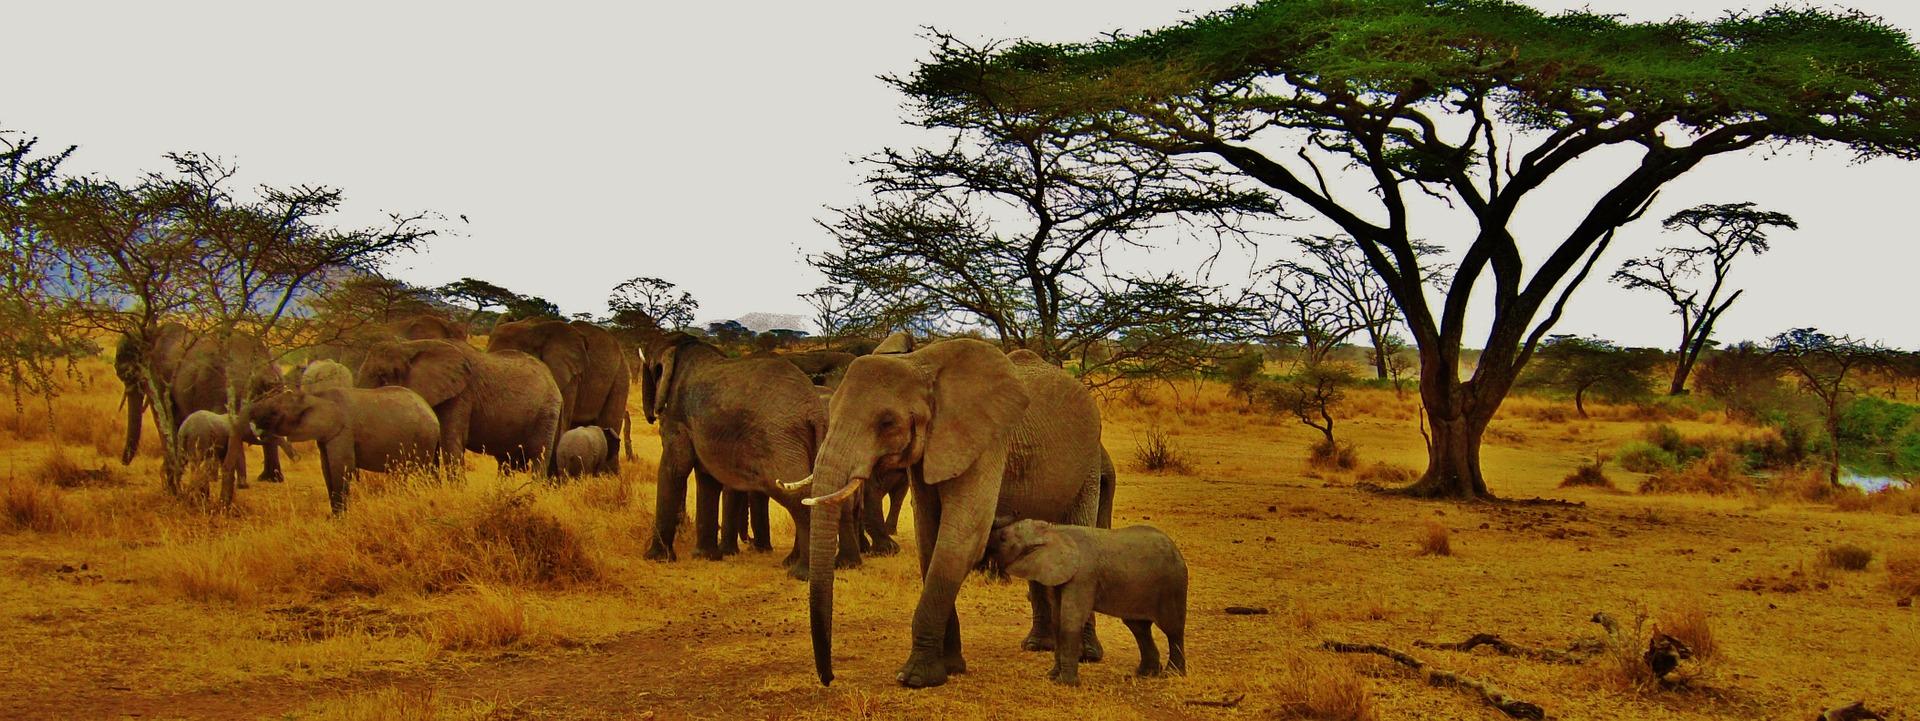 Tanzania e quenia africa travel brazil